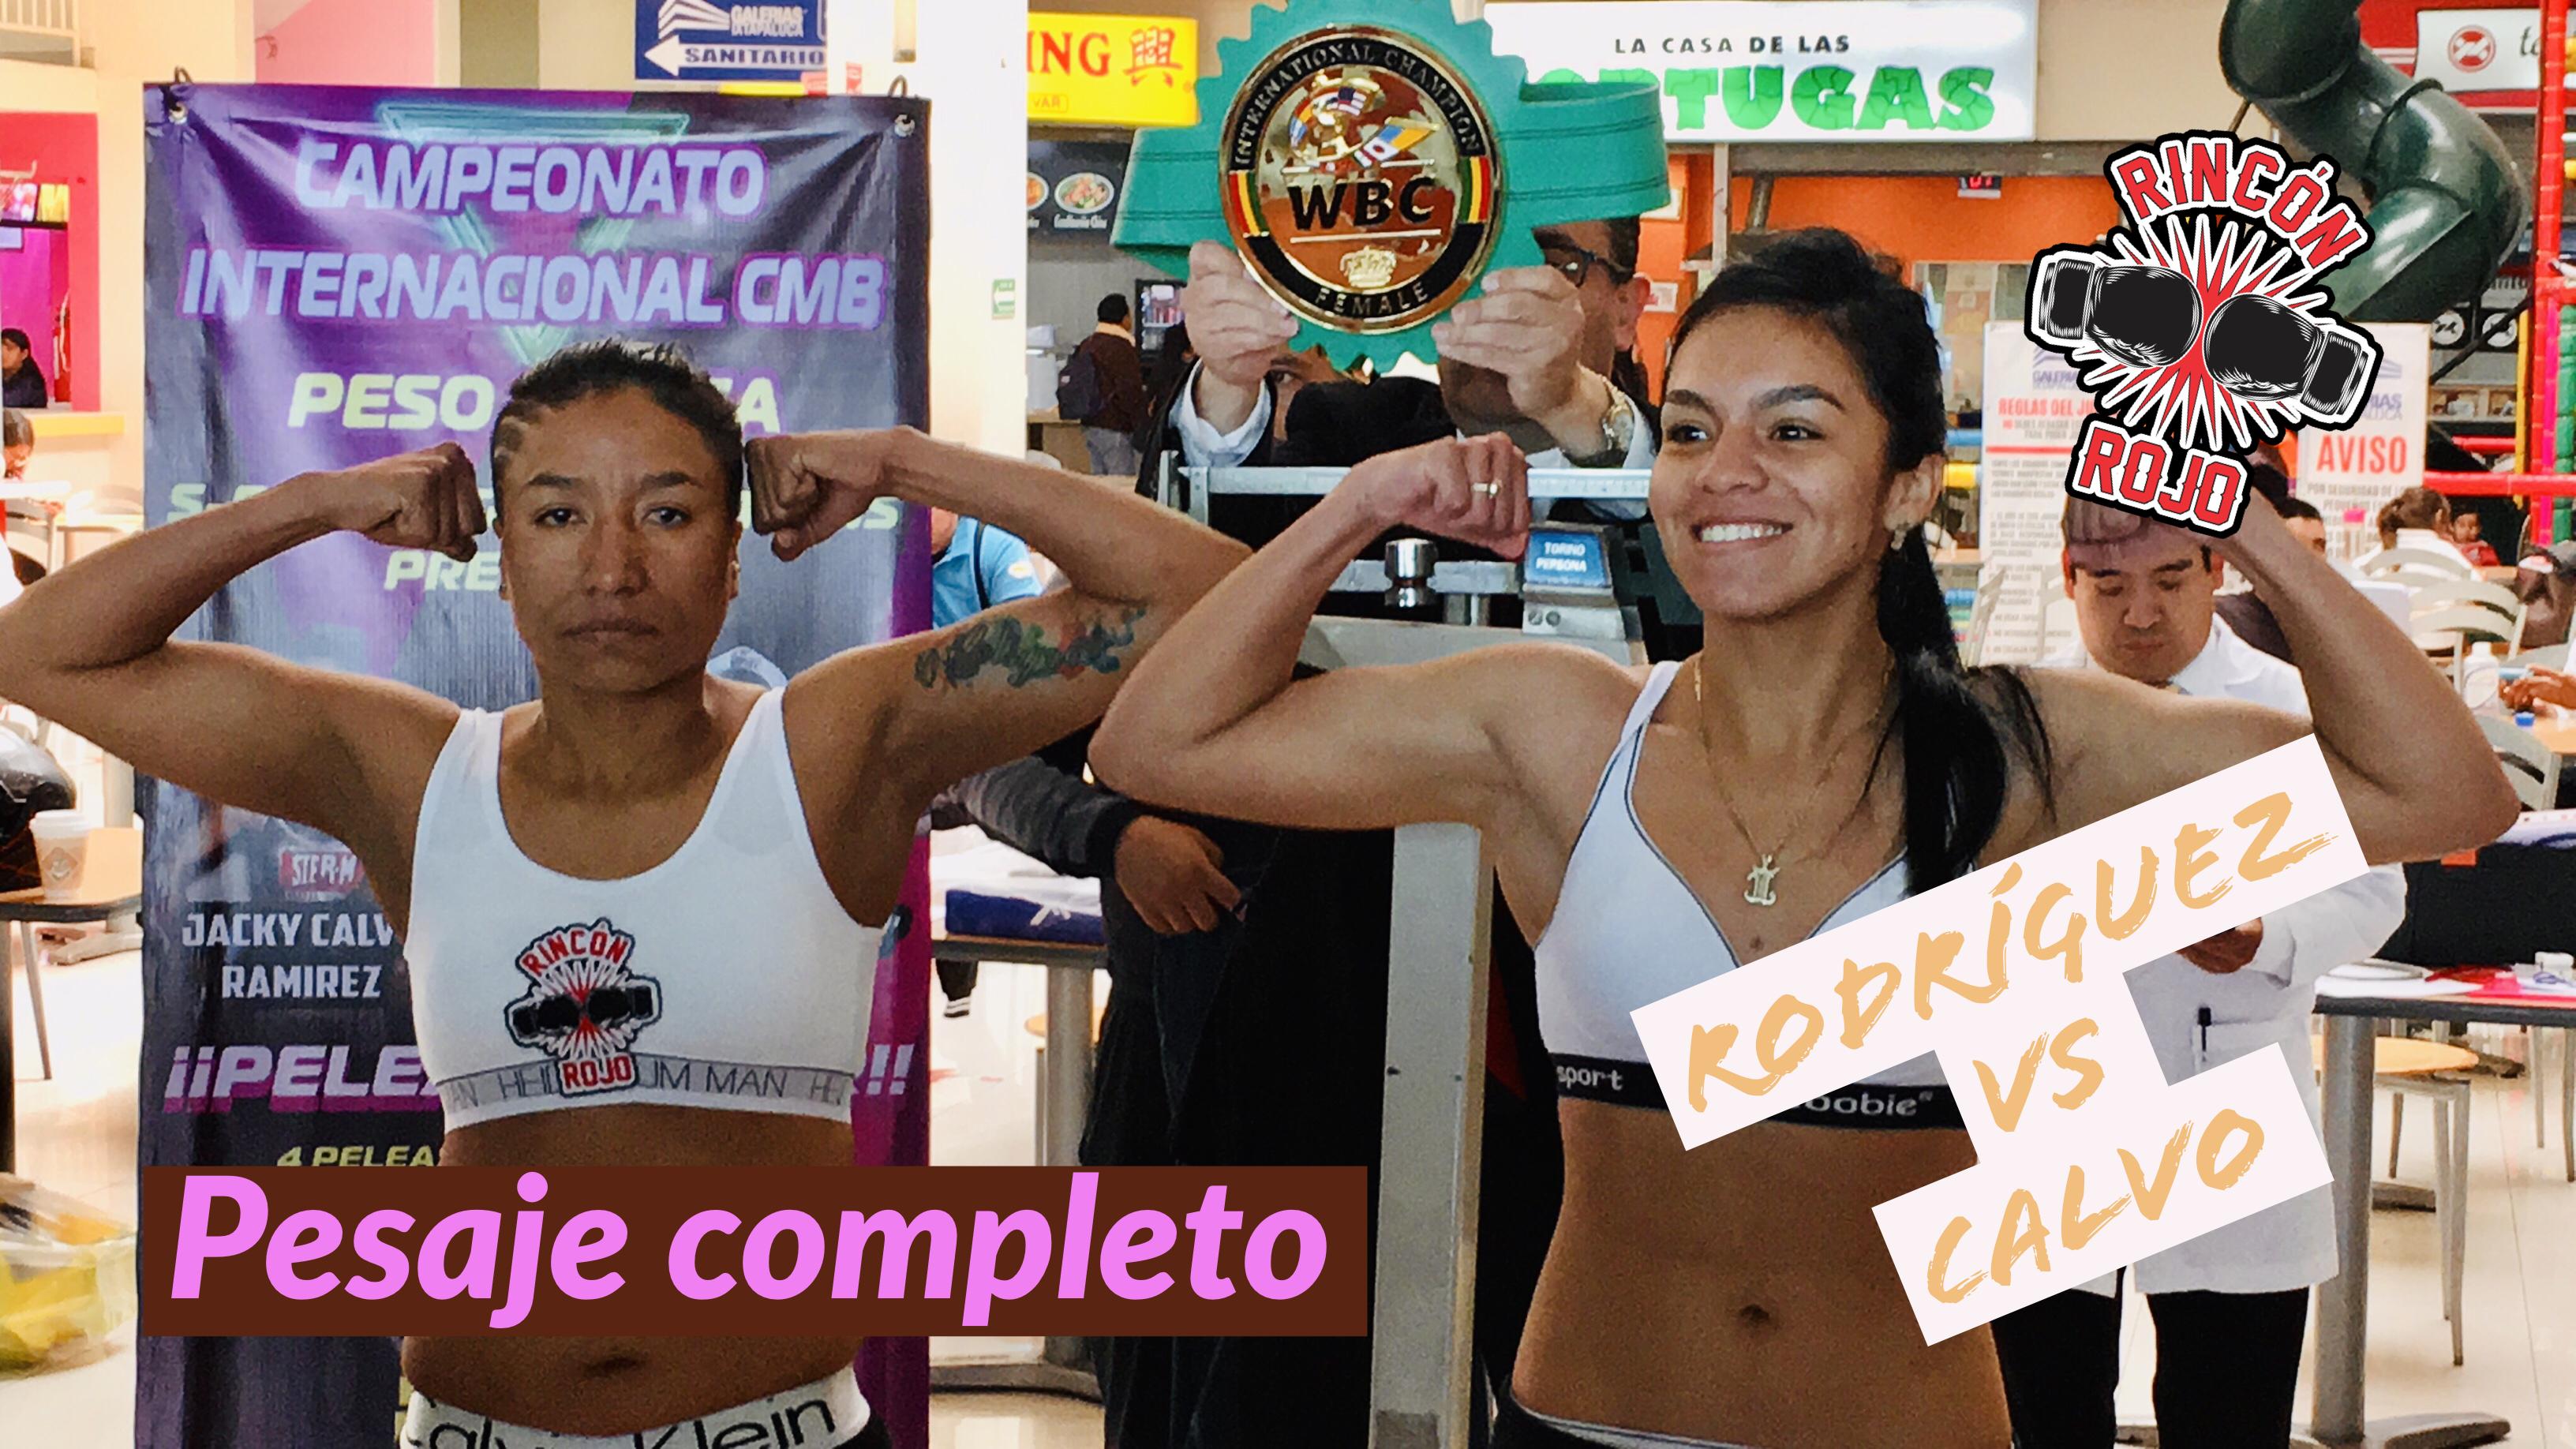 Calvo vs Rodríguez: pesaje